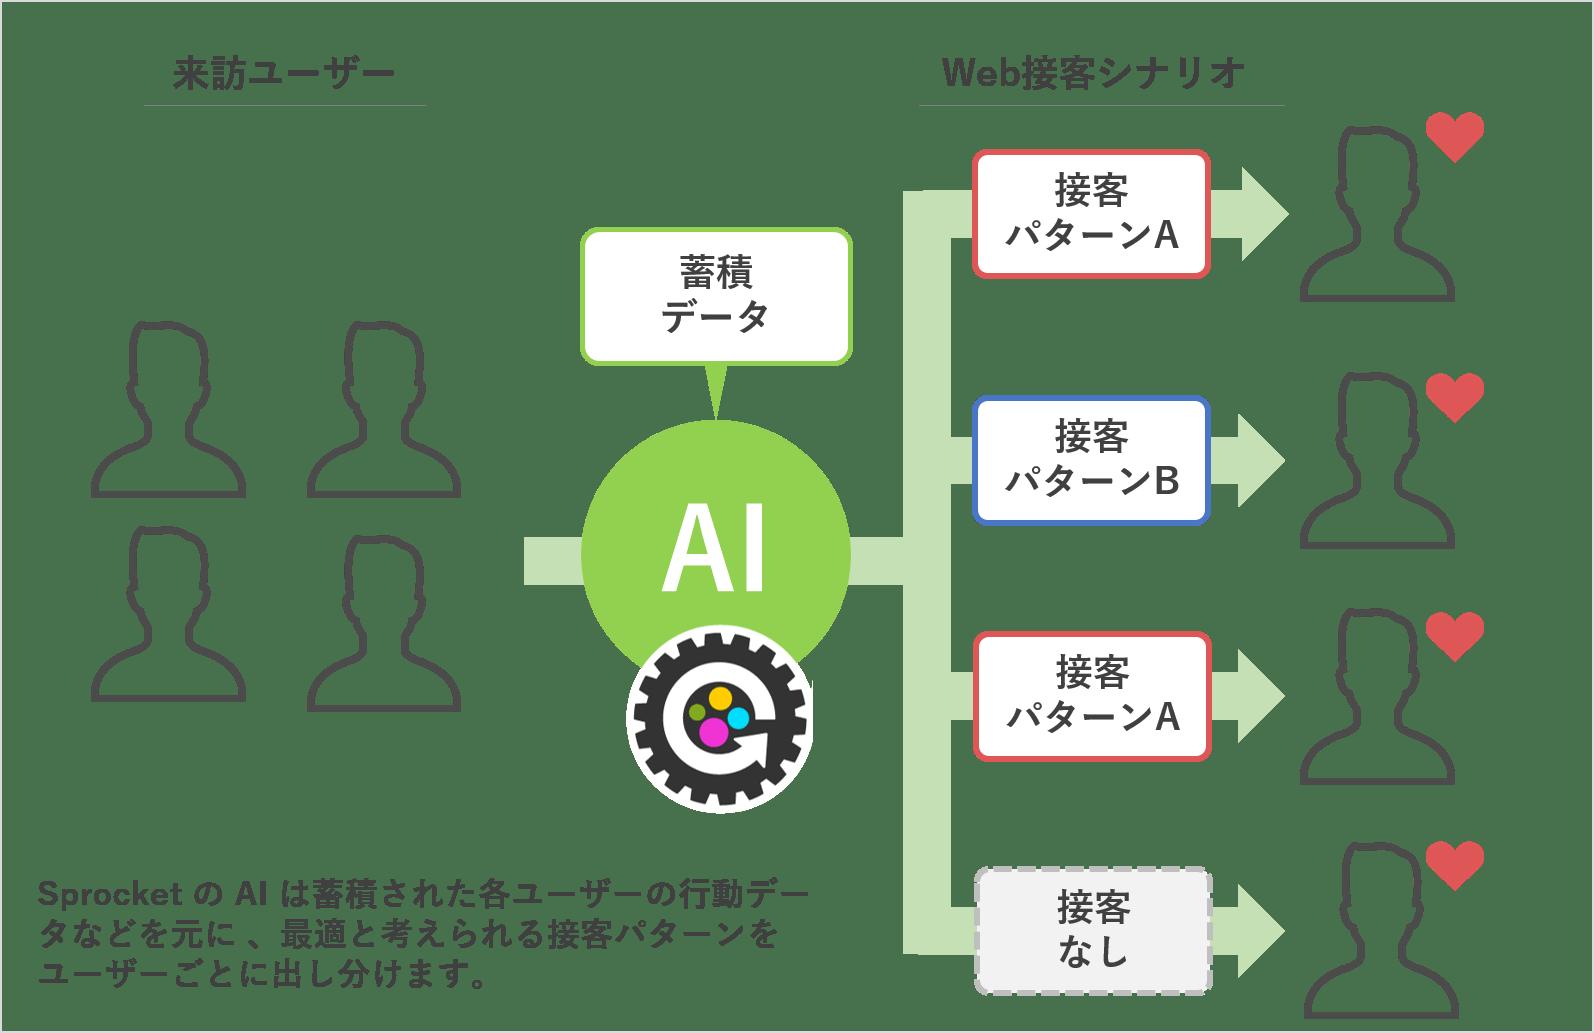 Web接客ツール「Sprocket」の導入事例を紹介_AI・人工知能製品ソリューション